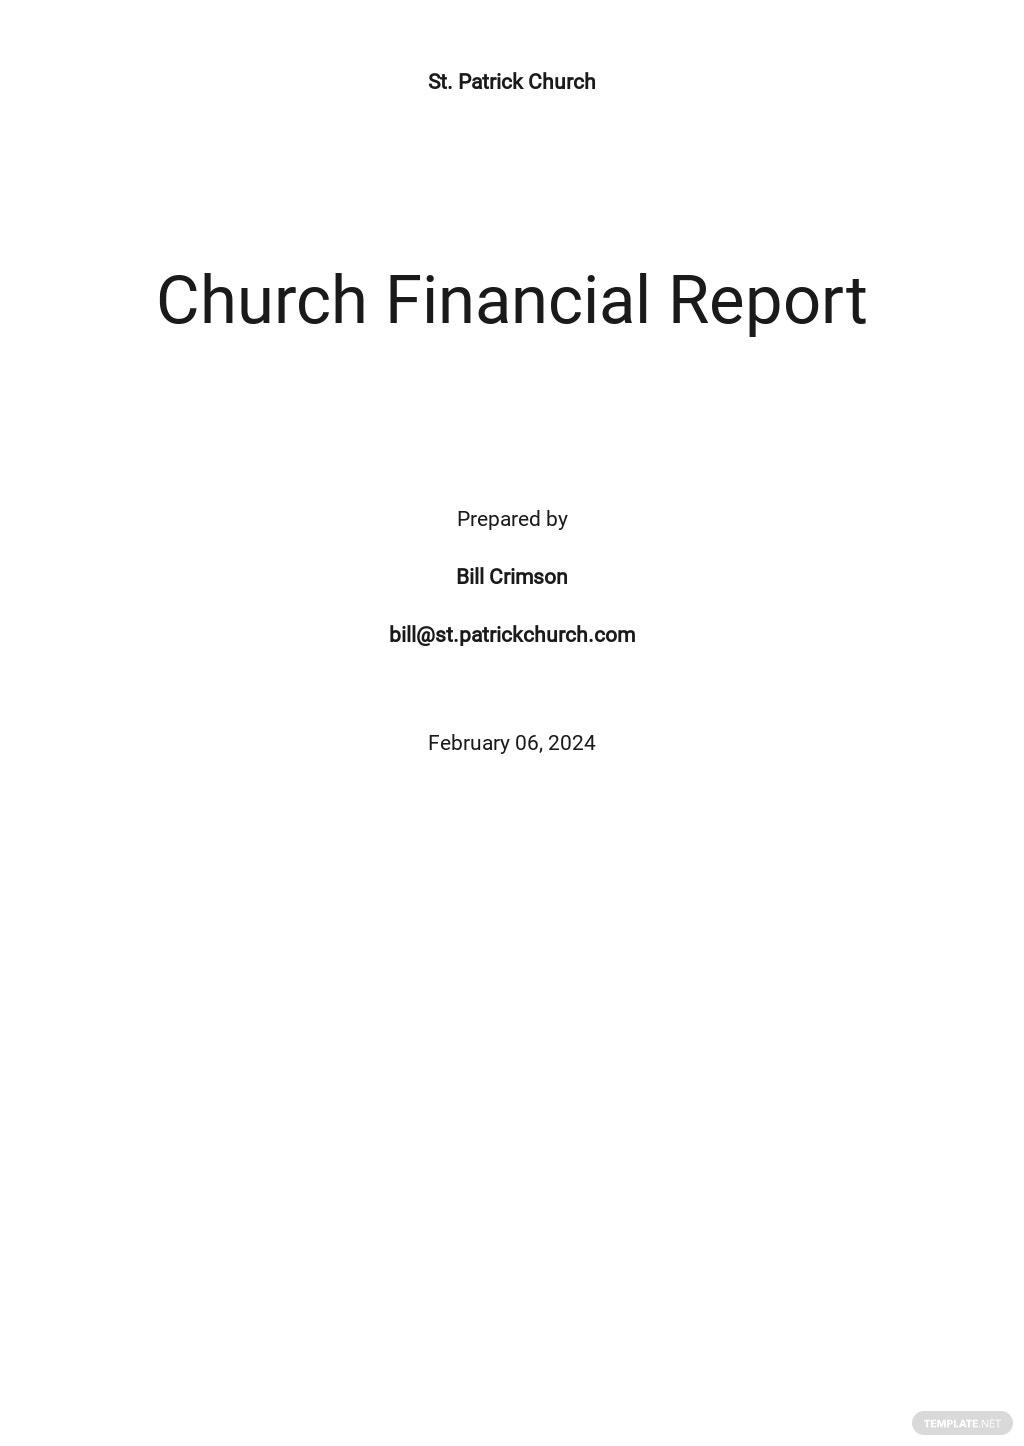 Church Financial Report Template.jpe